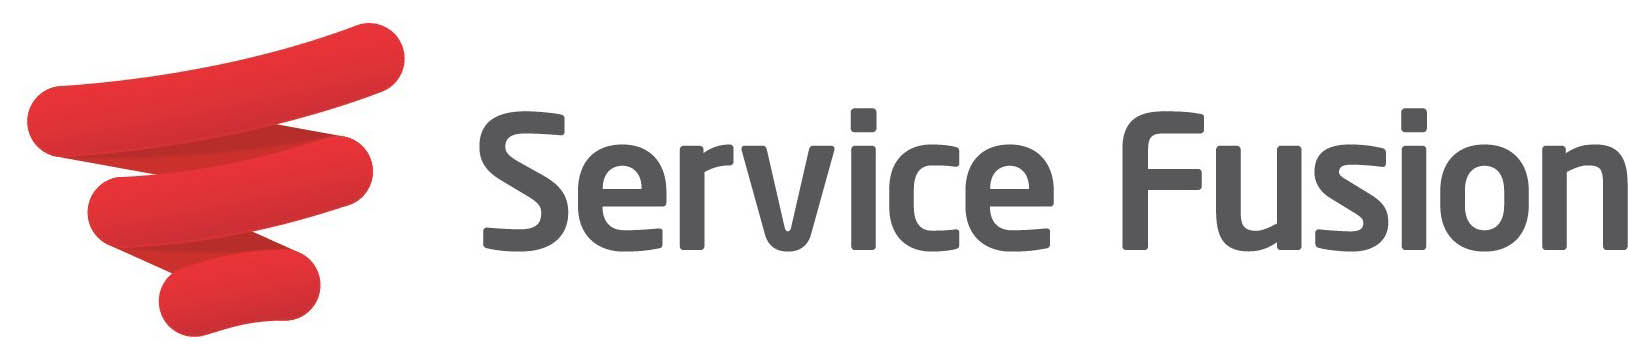 Service Fusion Logo